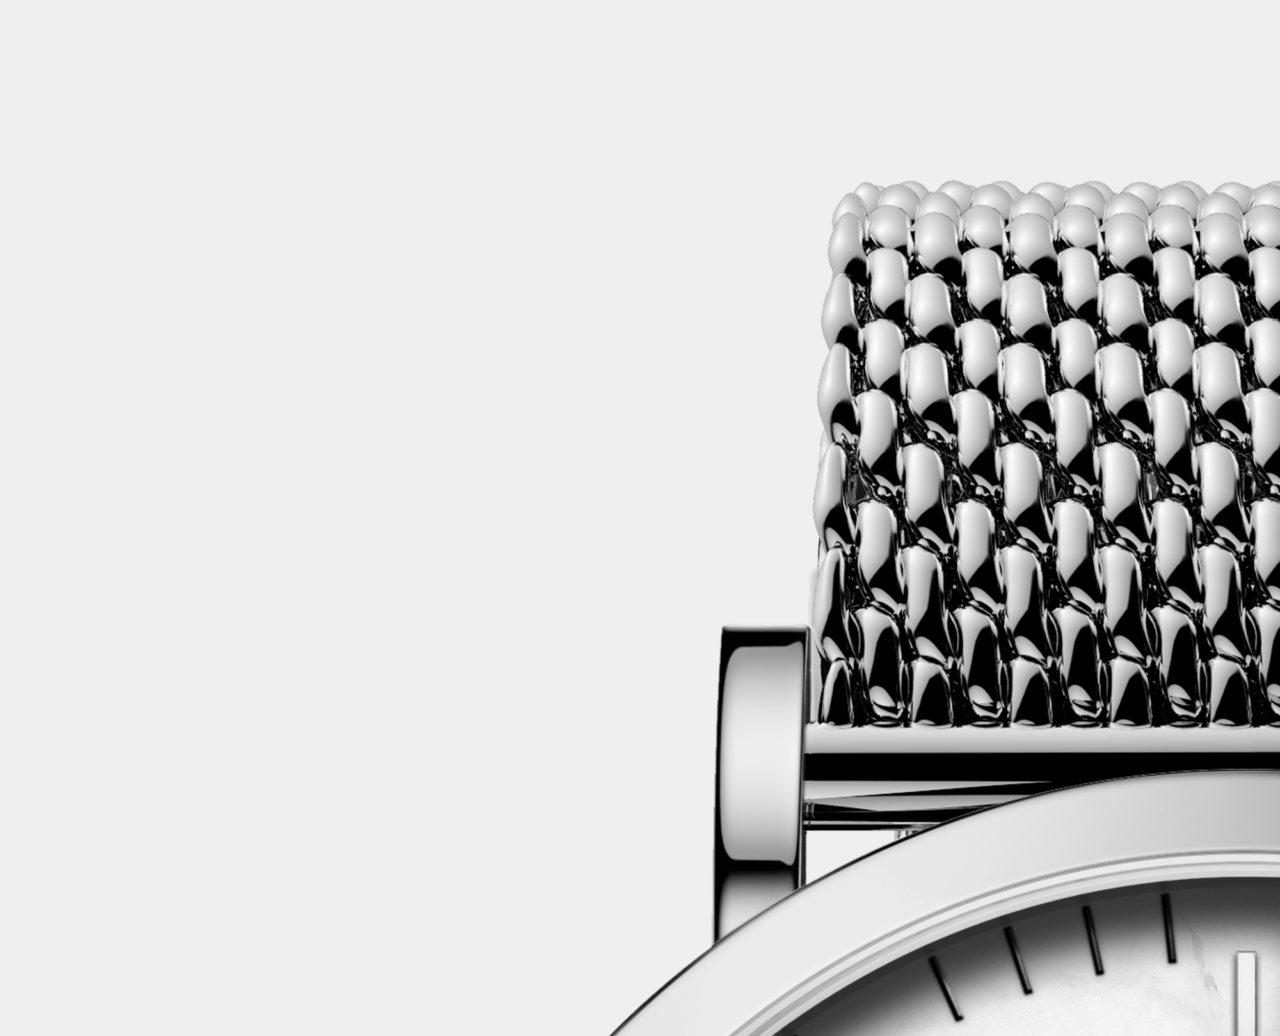 silver milanese mesh strap watch